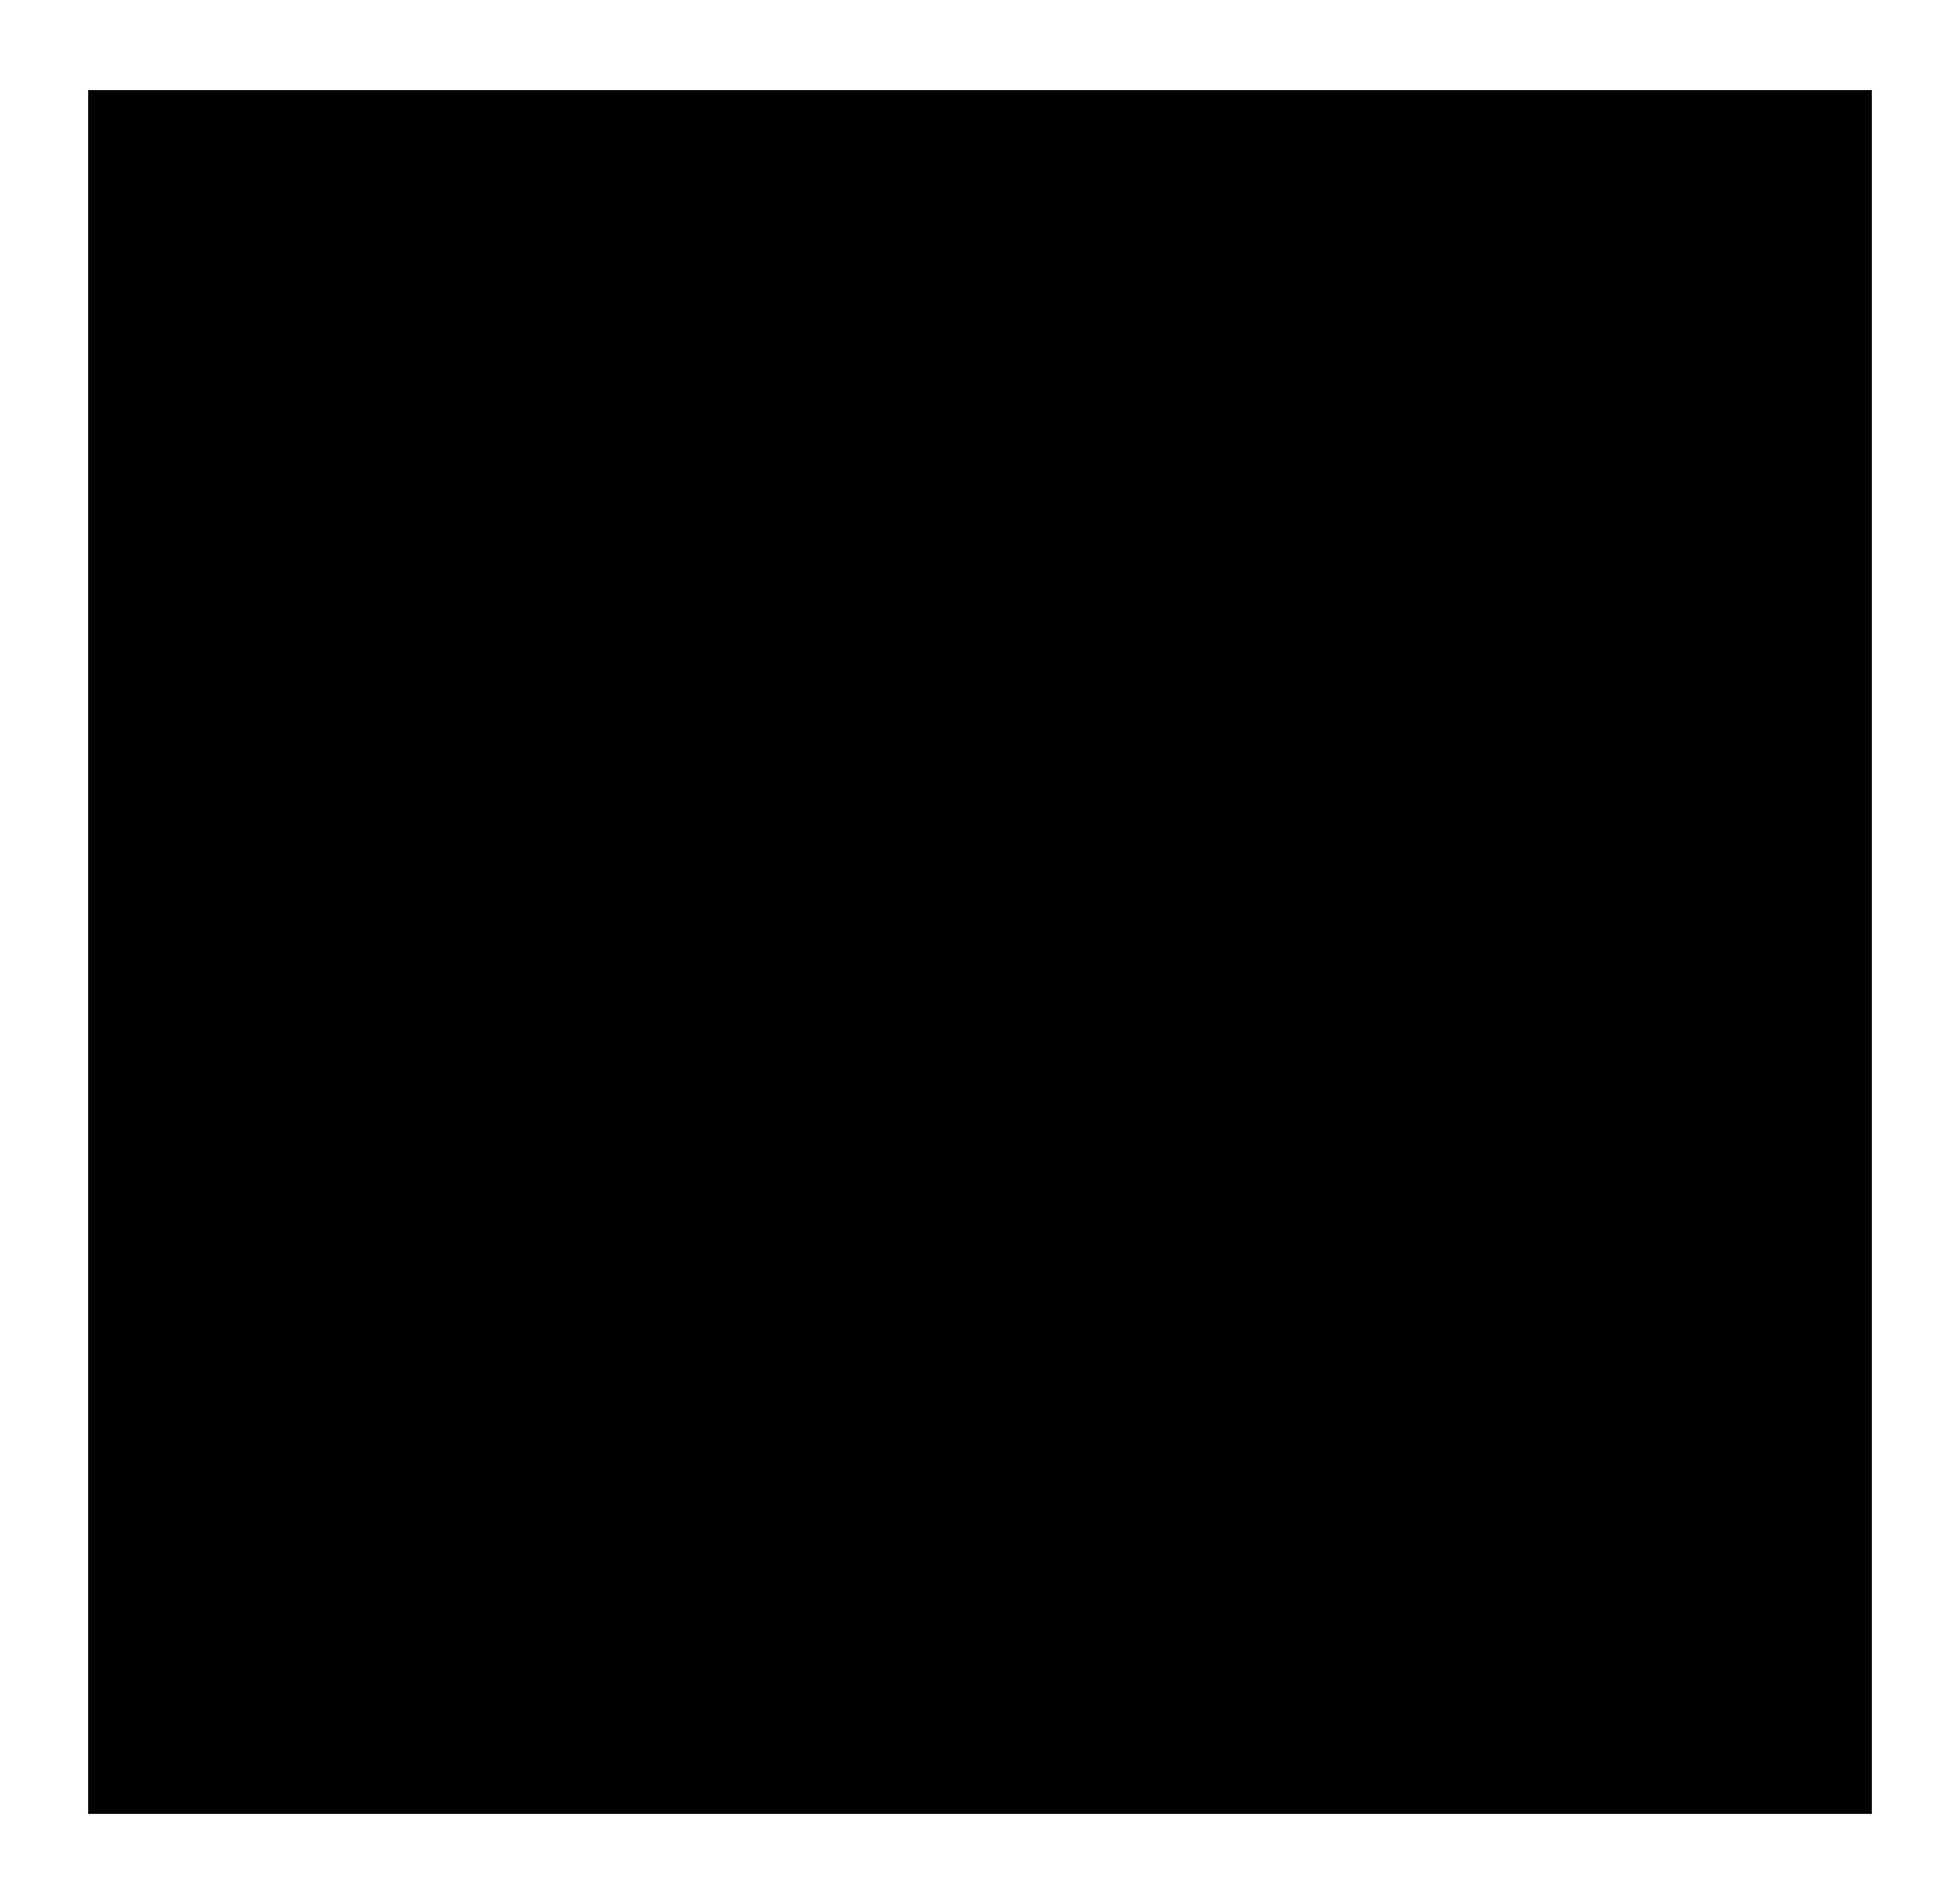 Cystine - Wikipedia